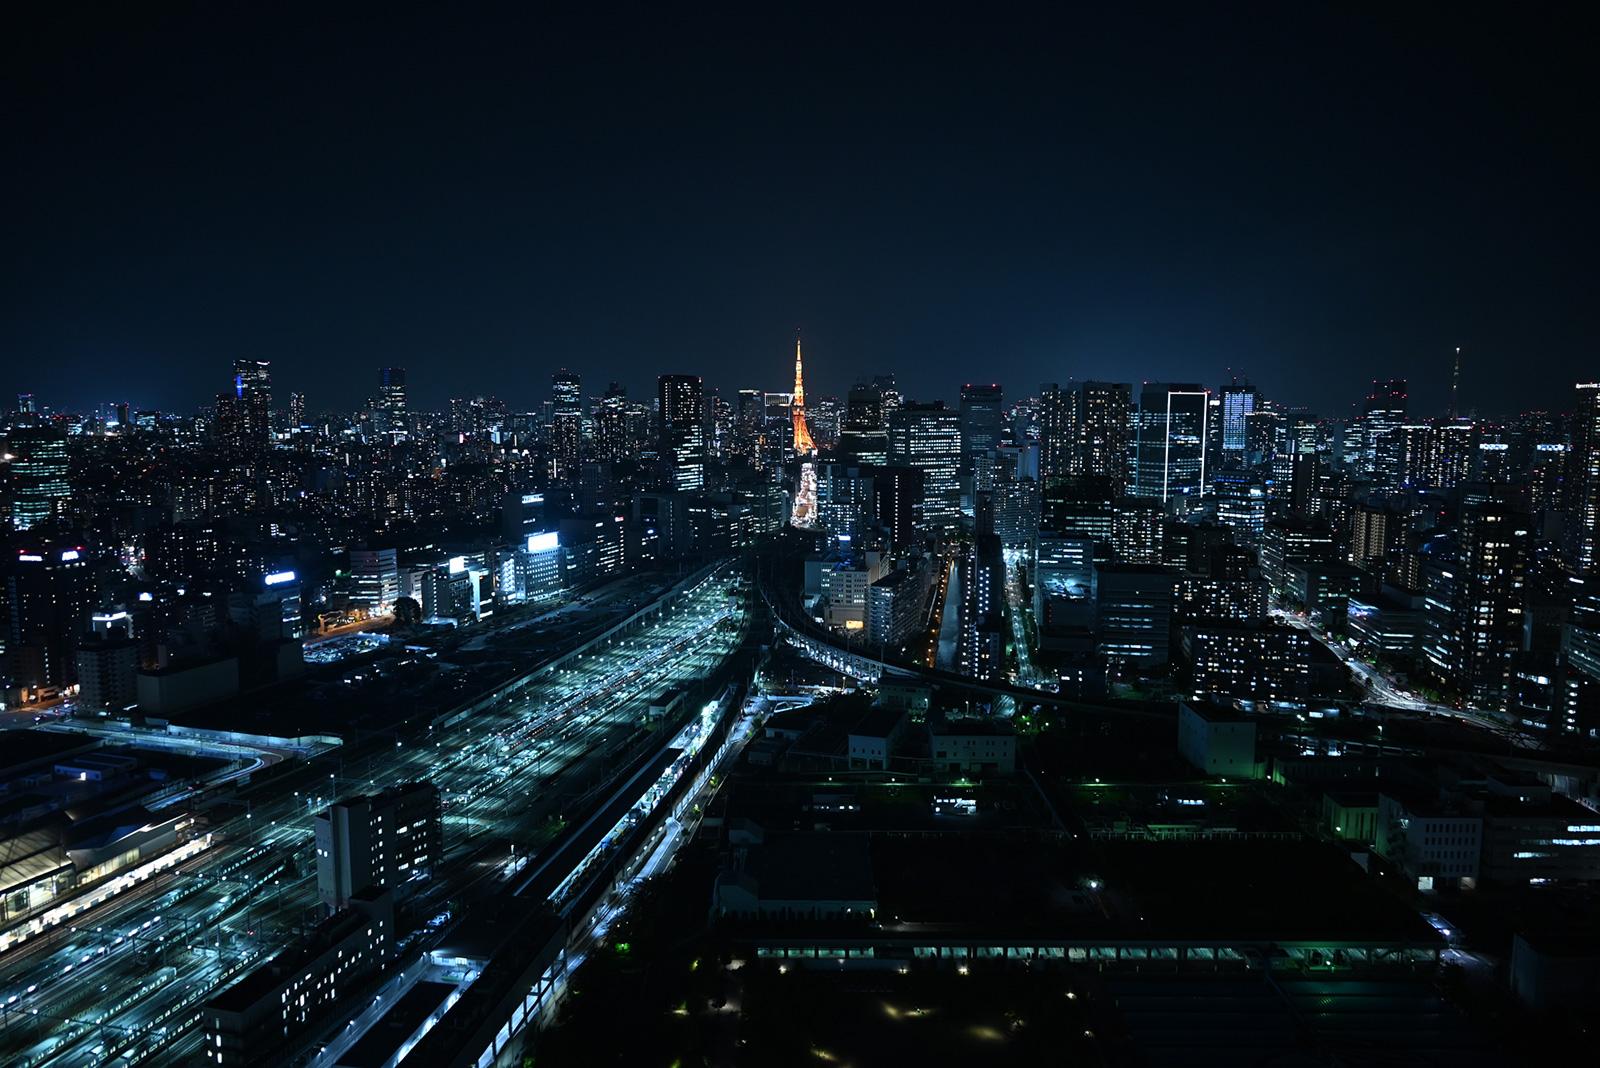 Sample Nikon Z5 image of night cityscape